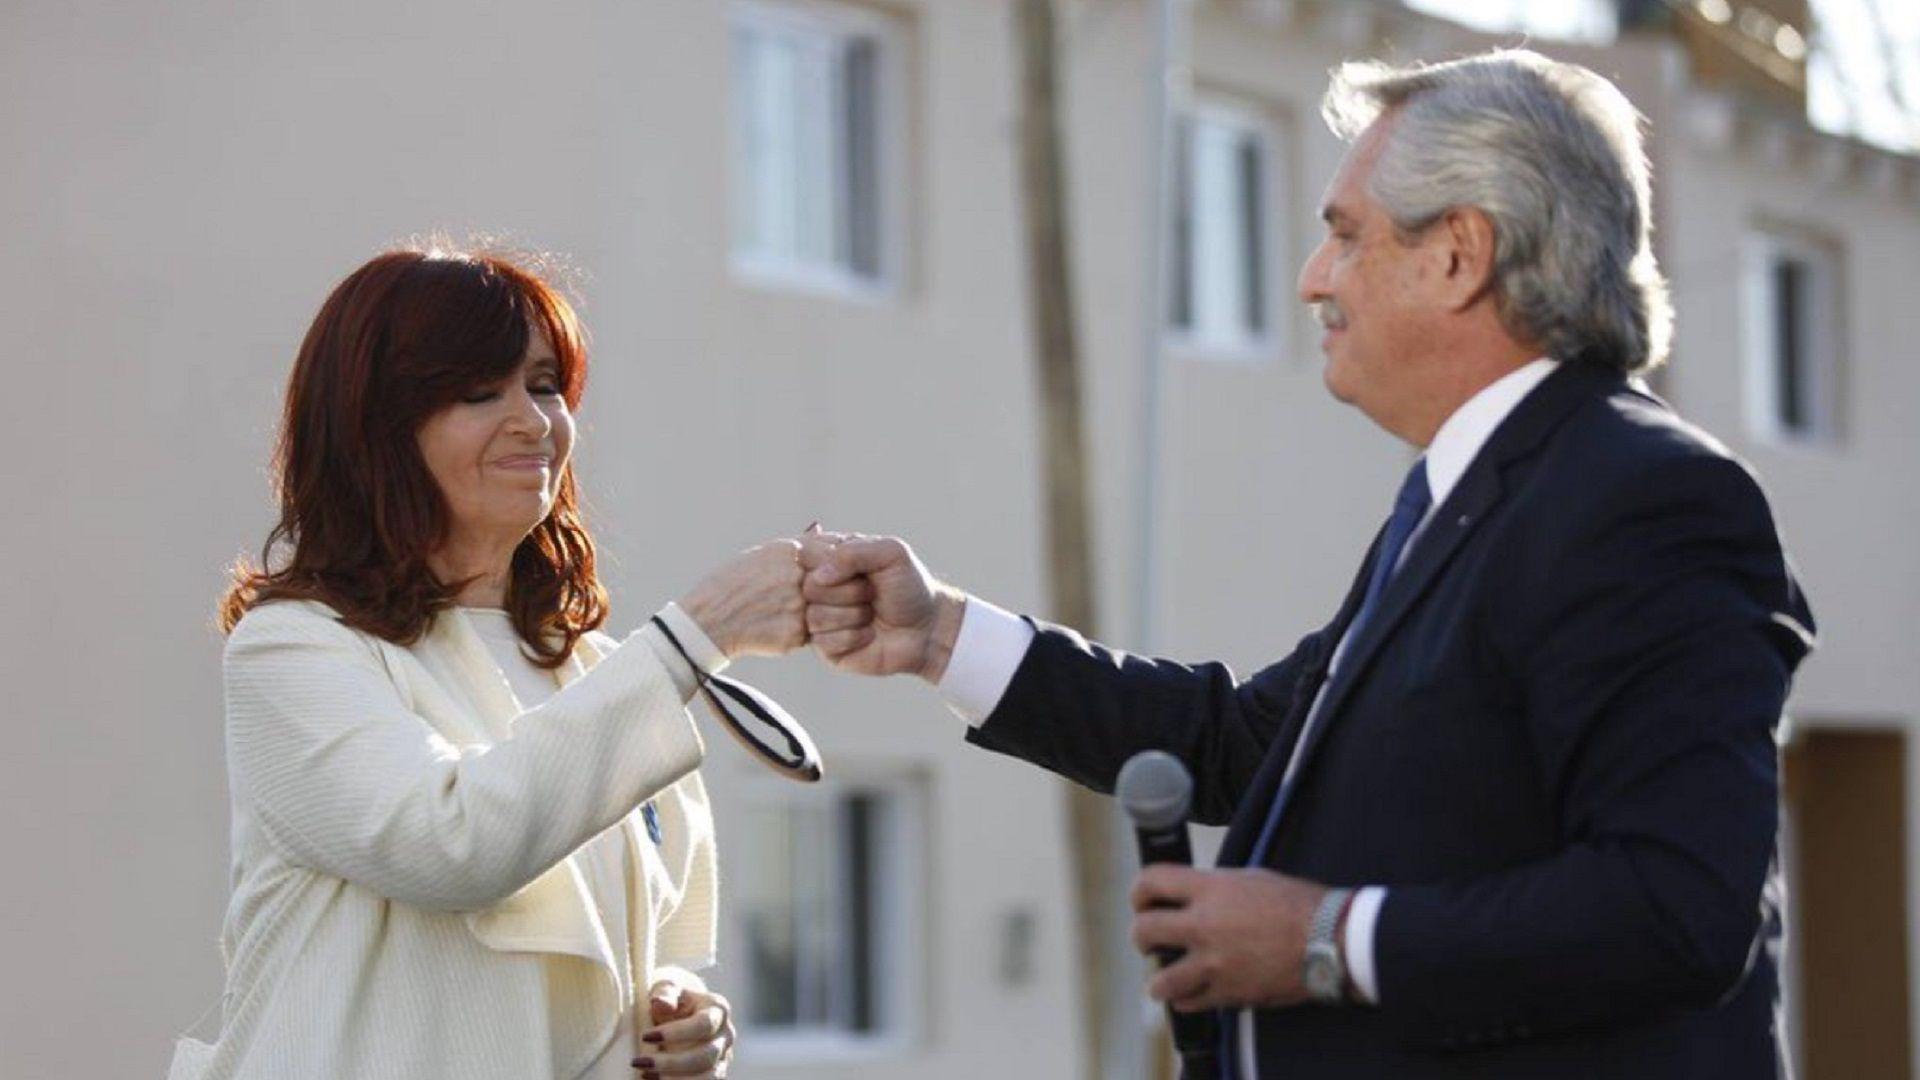 Cristina Kirchner y Alberto Fernández en Avellaneda